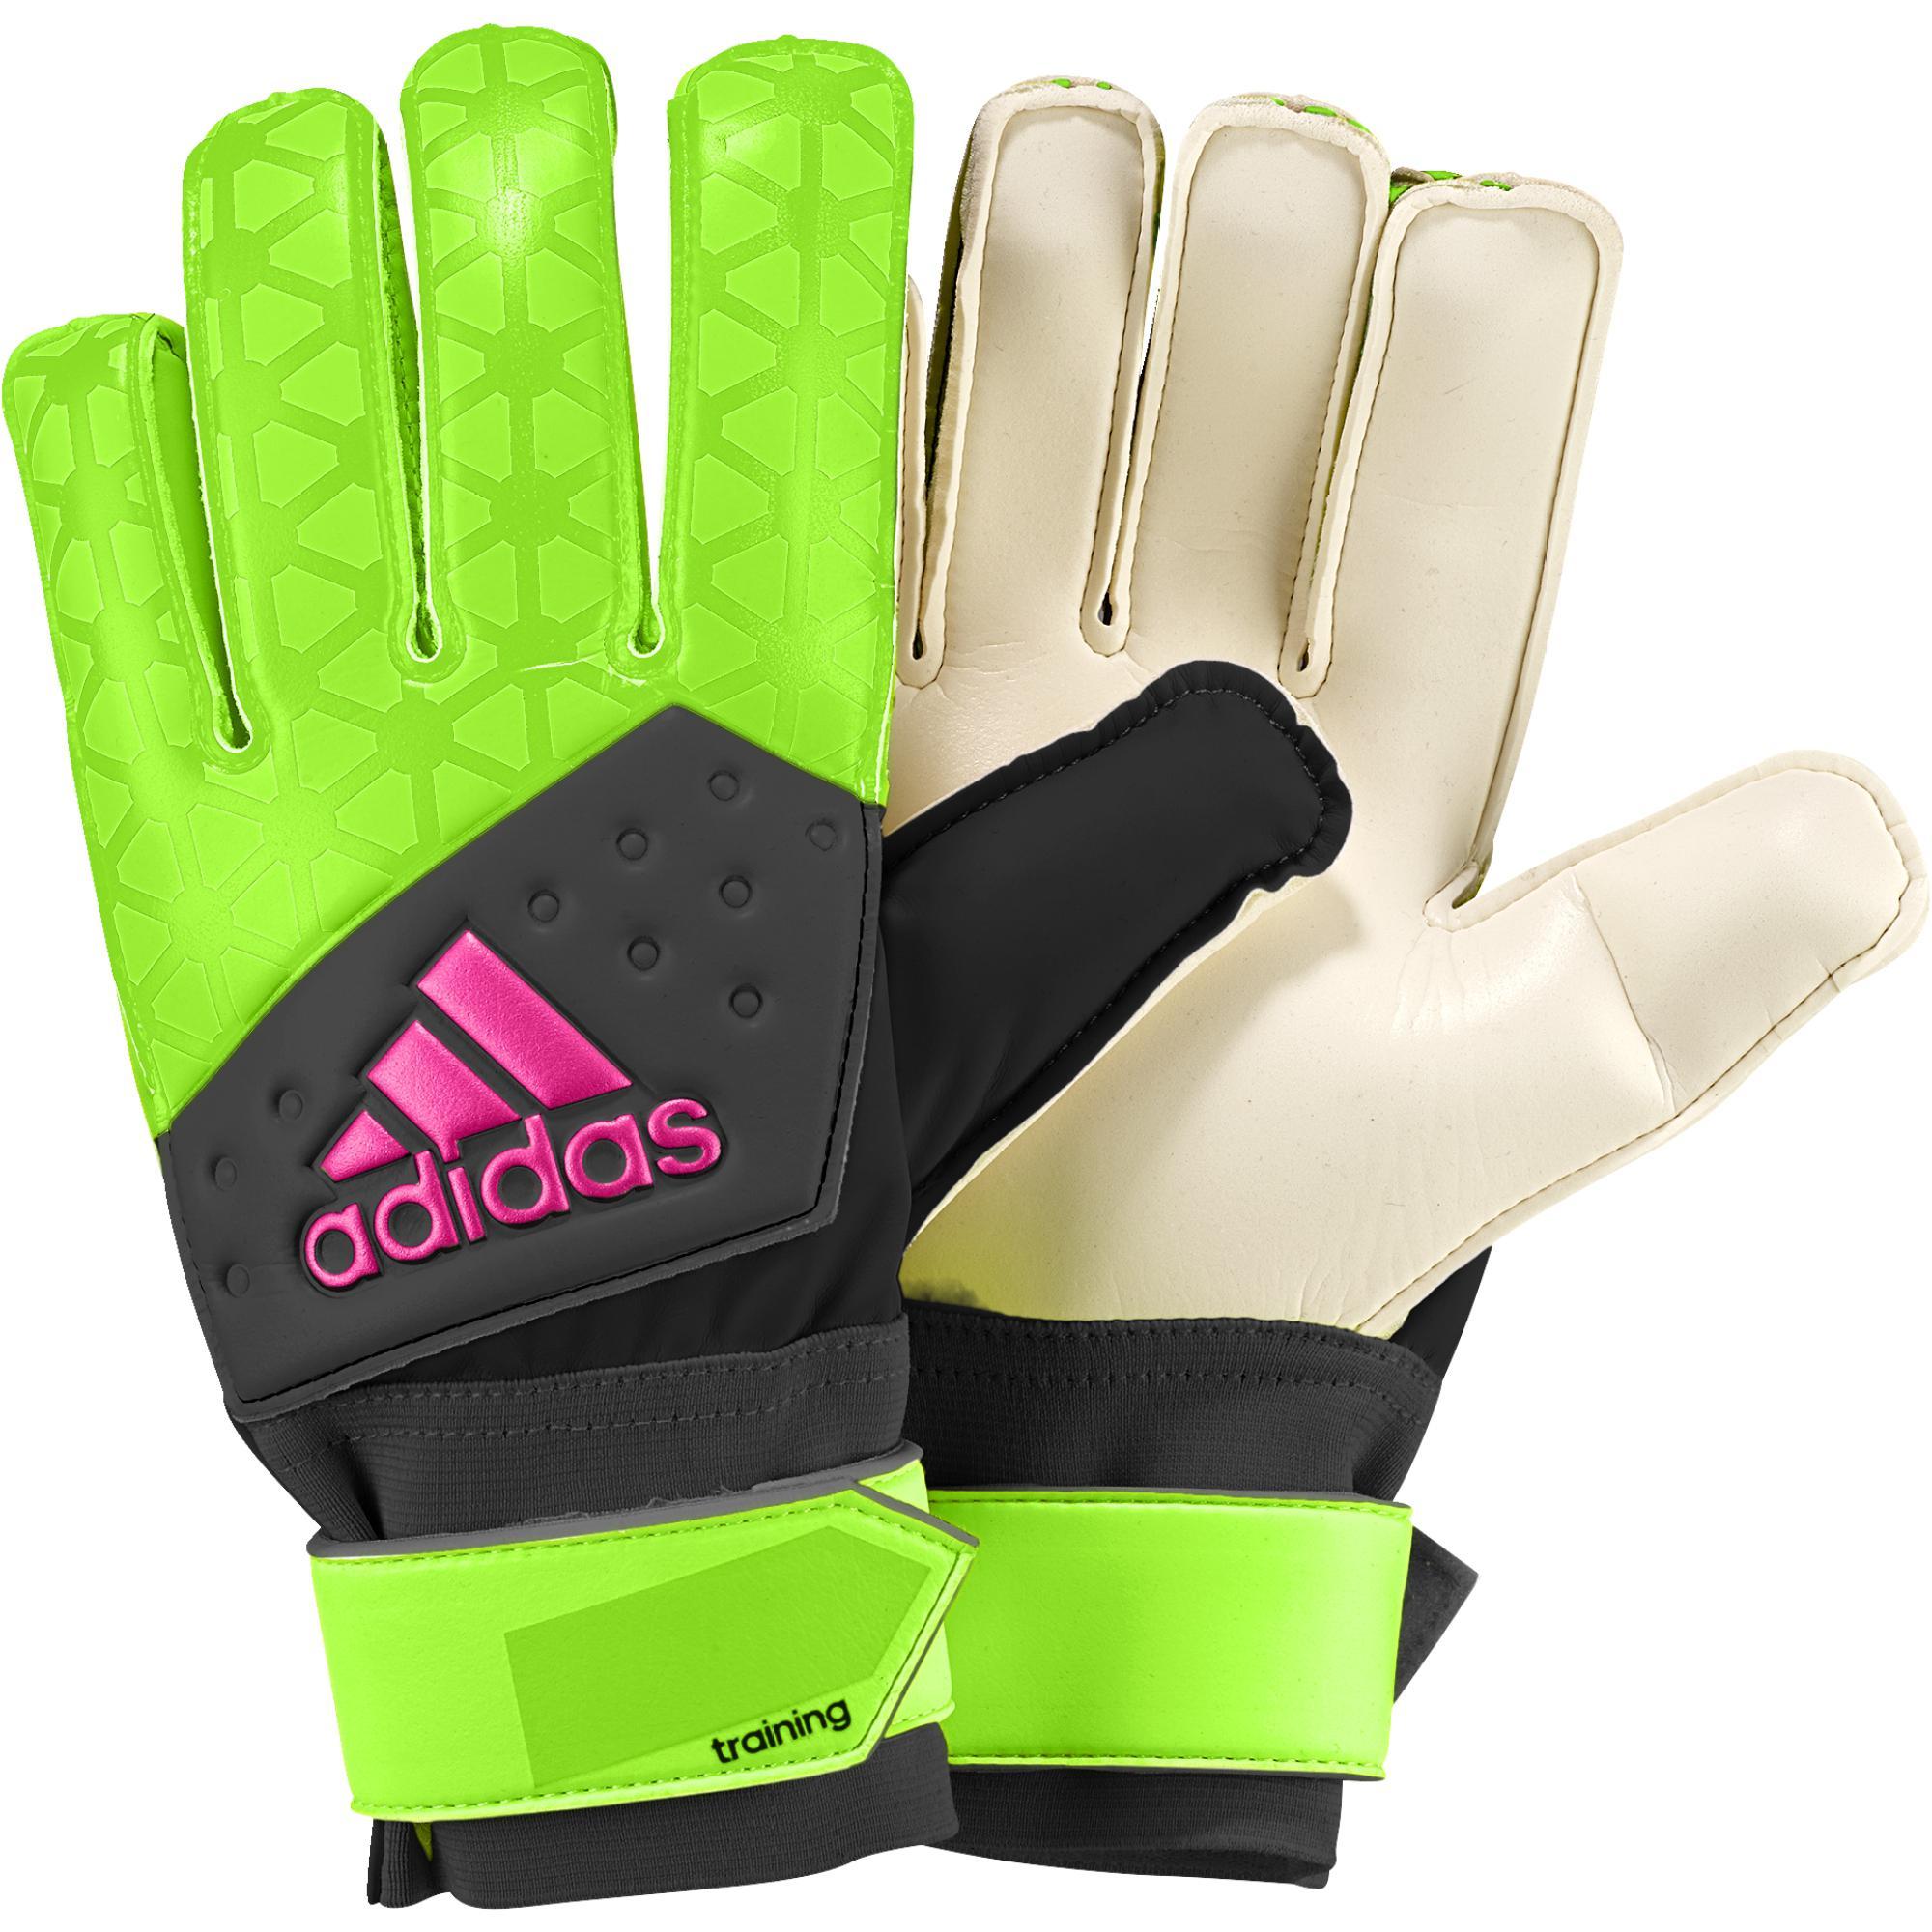 ADIDAS brankářské rukavice Ace Training